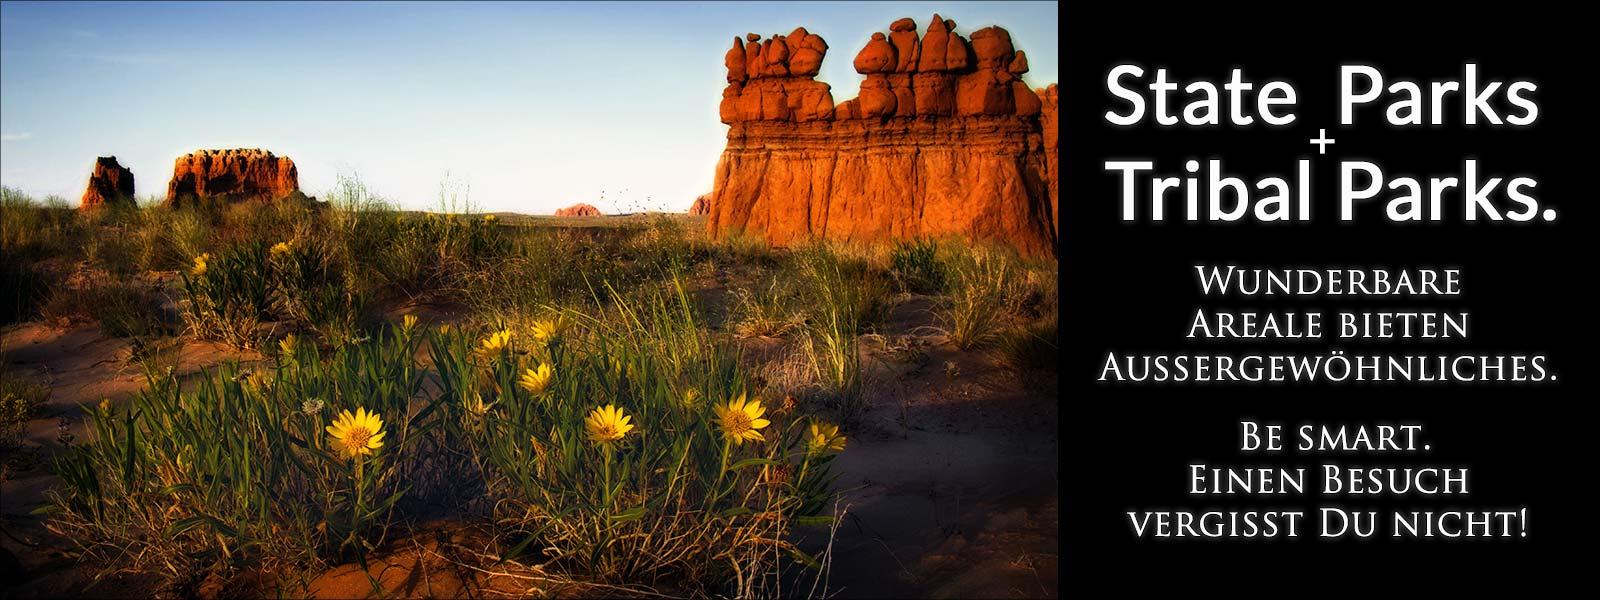 USA State Parks und Tribal Parks